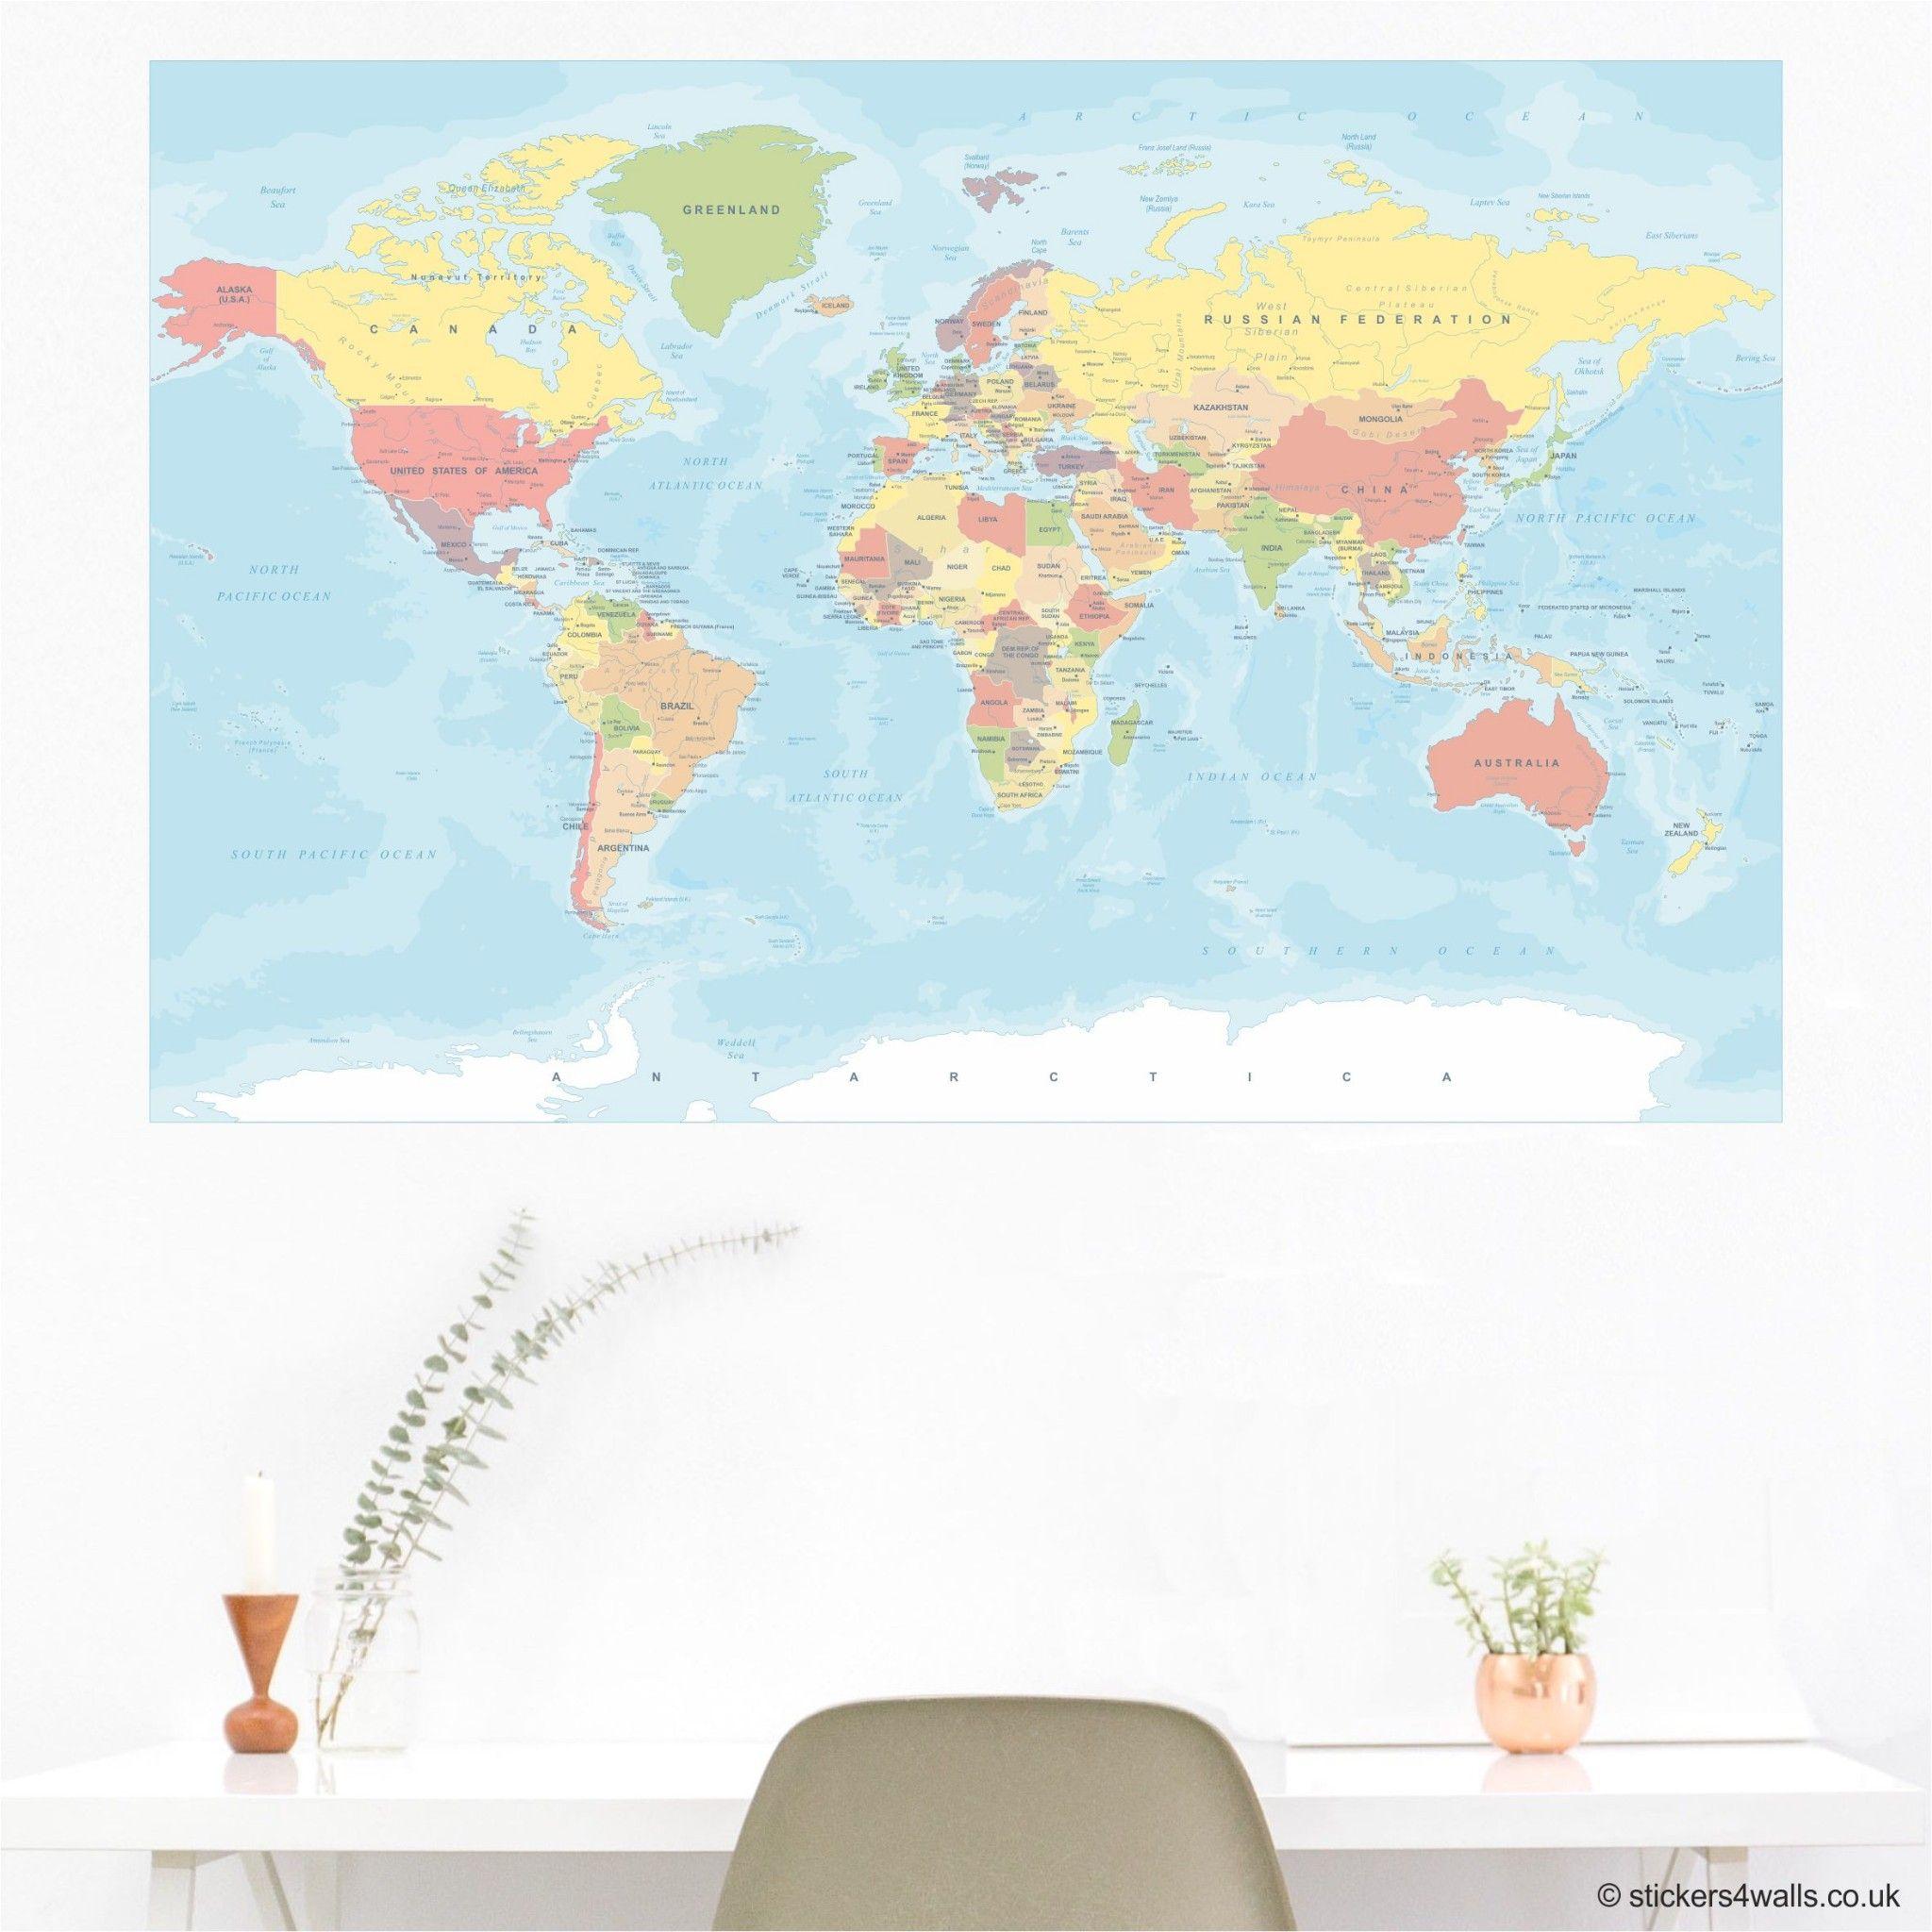 A High Quality Political World Map Wall Sticker Decal, Ideal